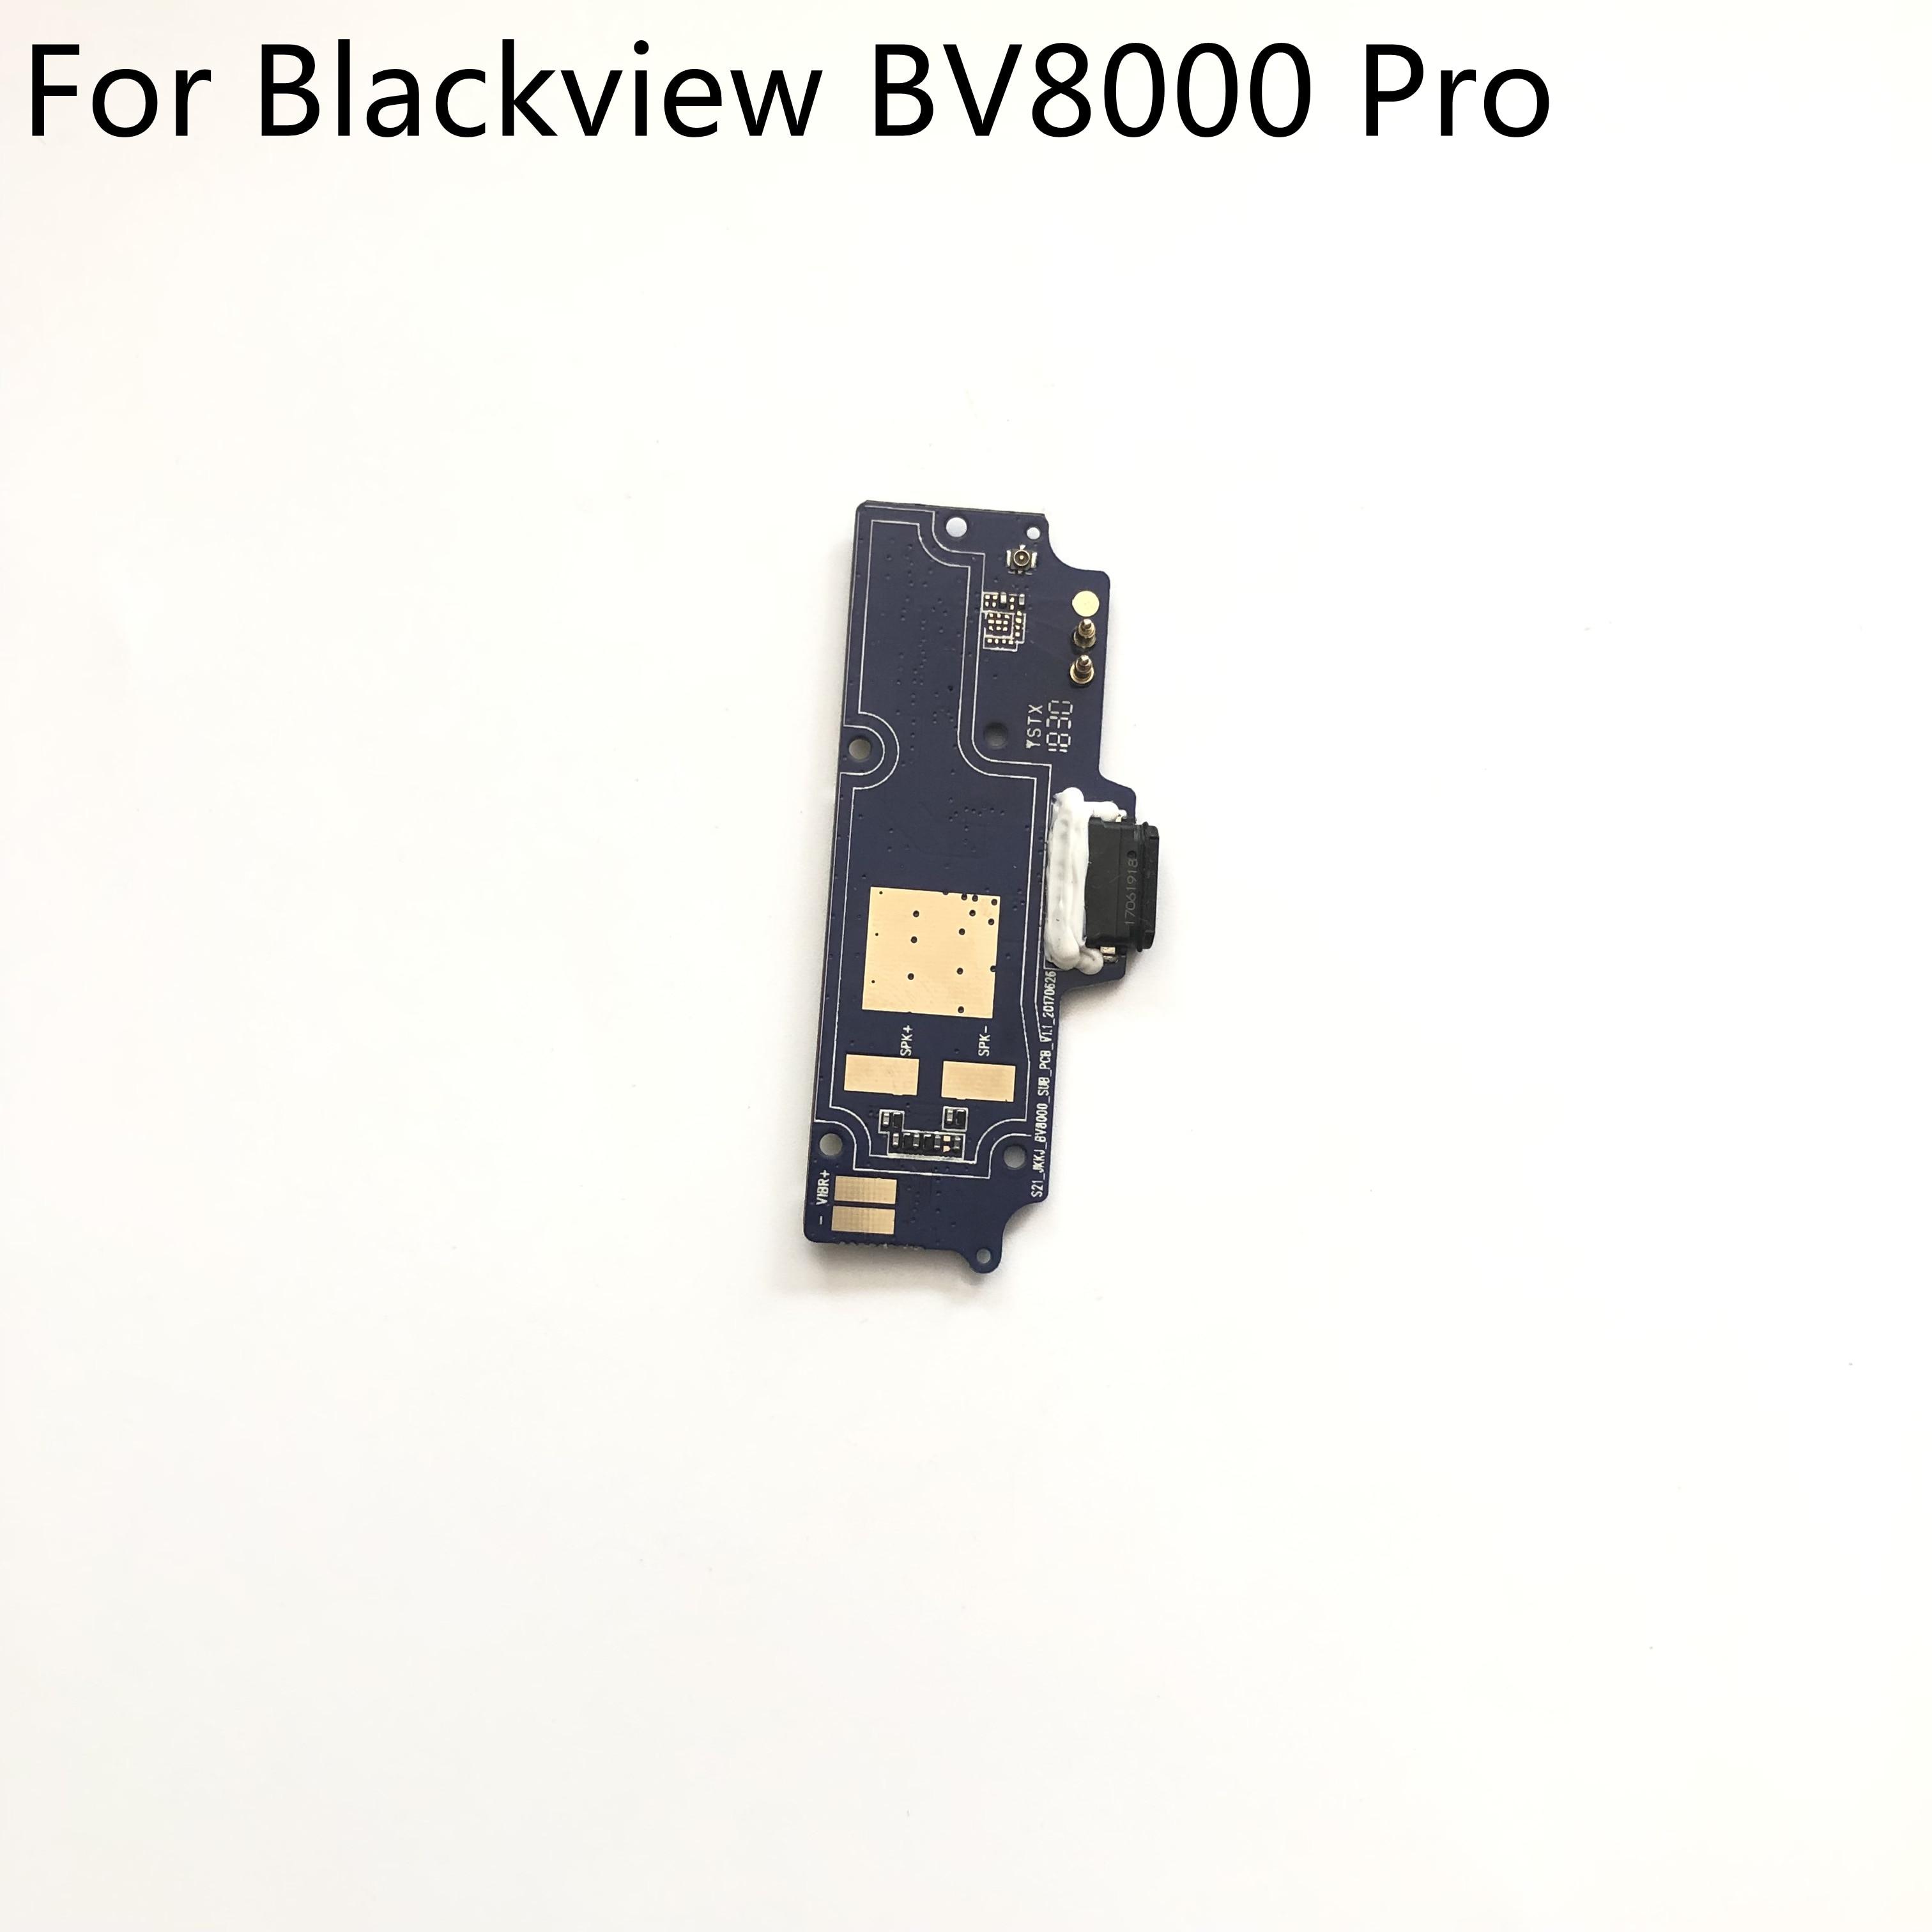 nova blackview bv8000 original usb plug placa de carga para blackview bv8000 pro